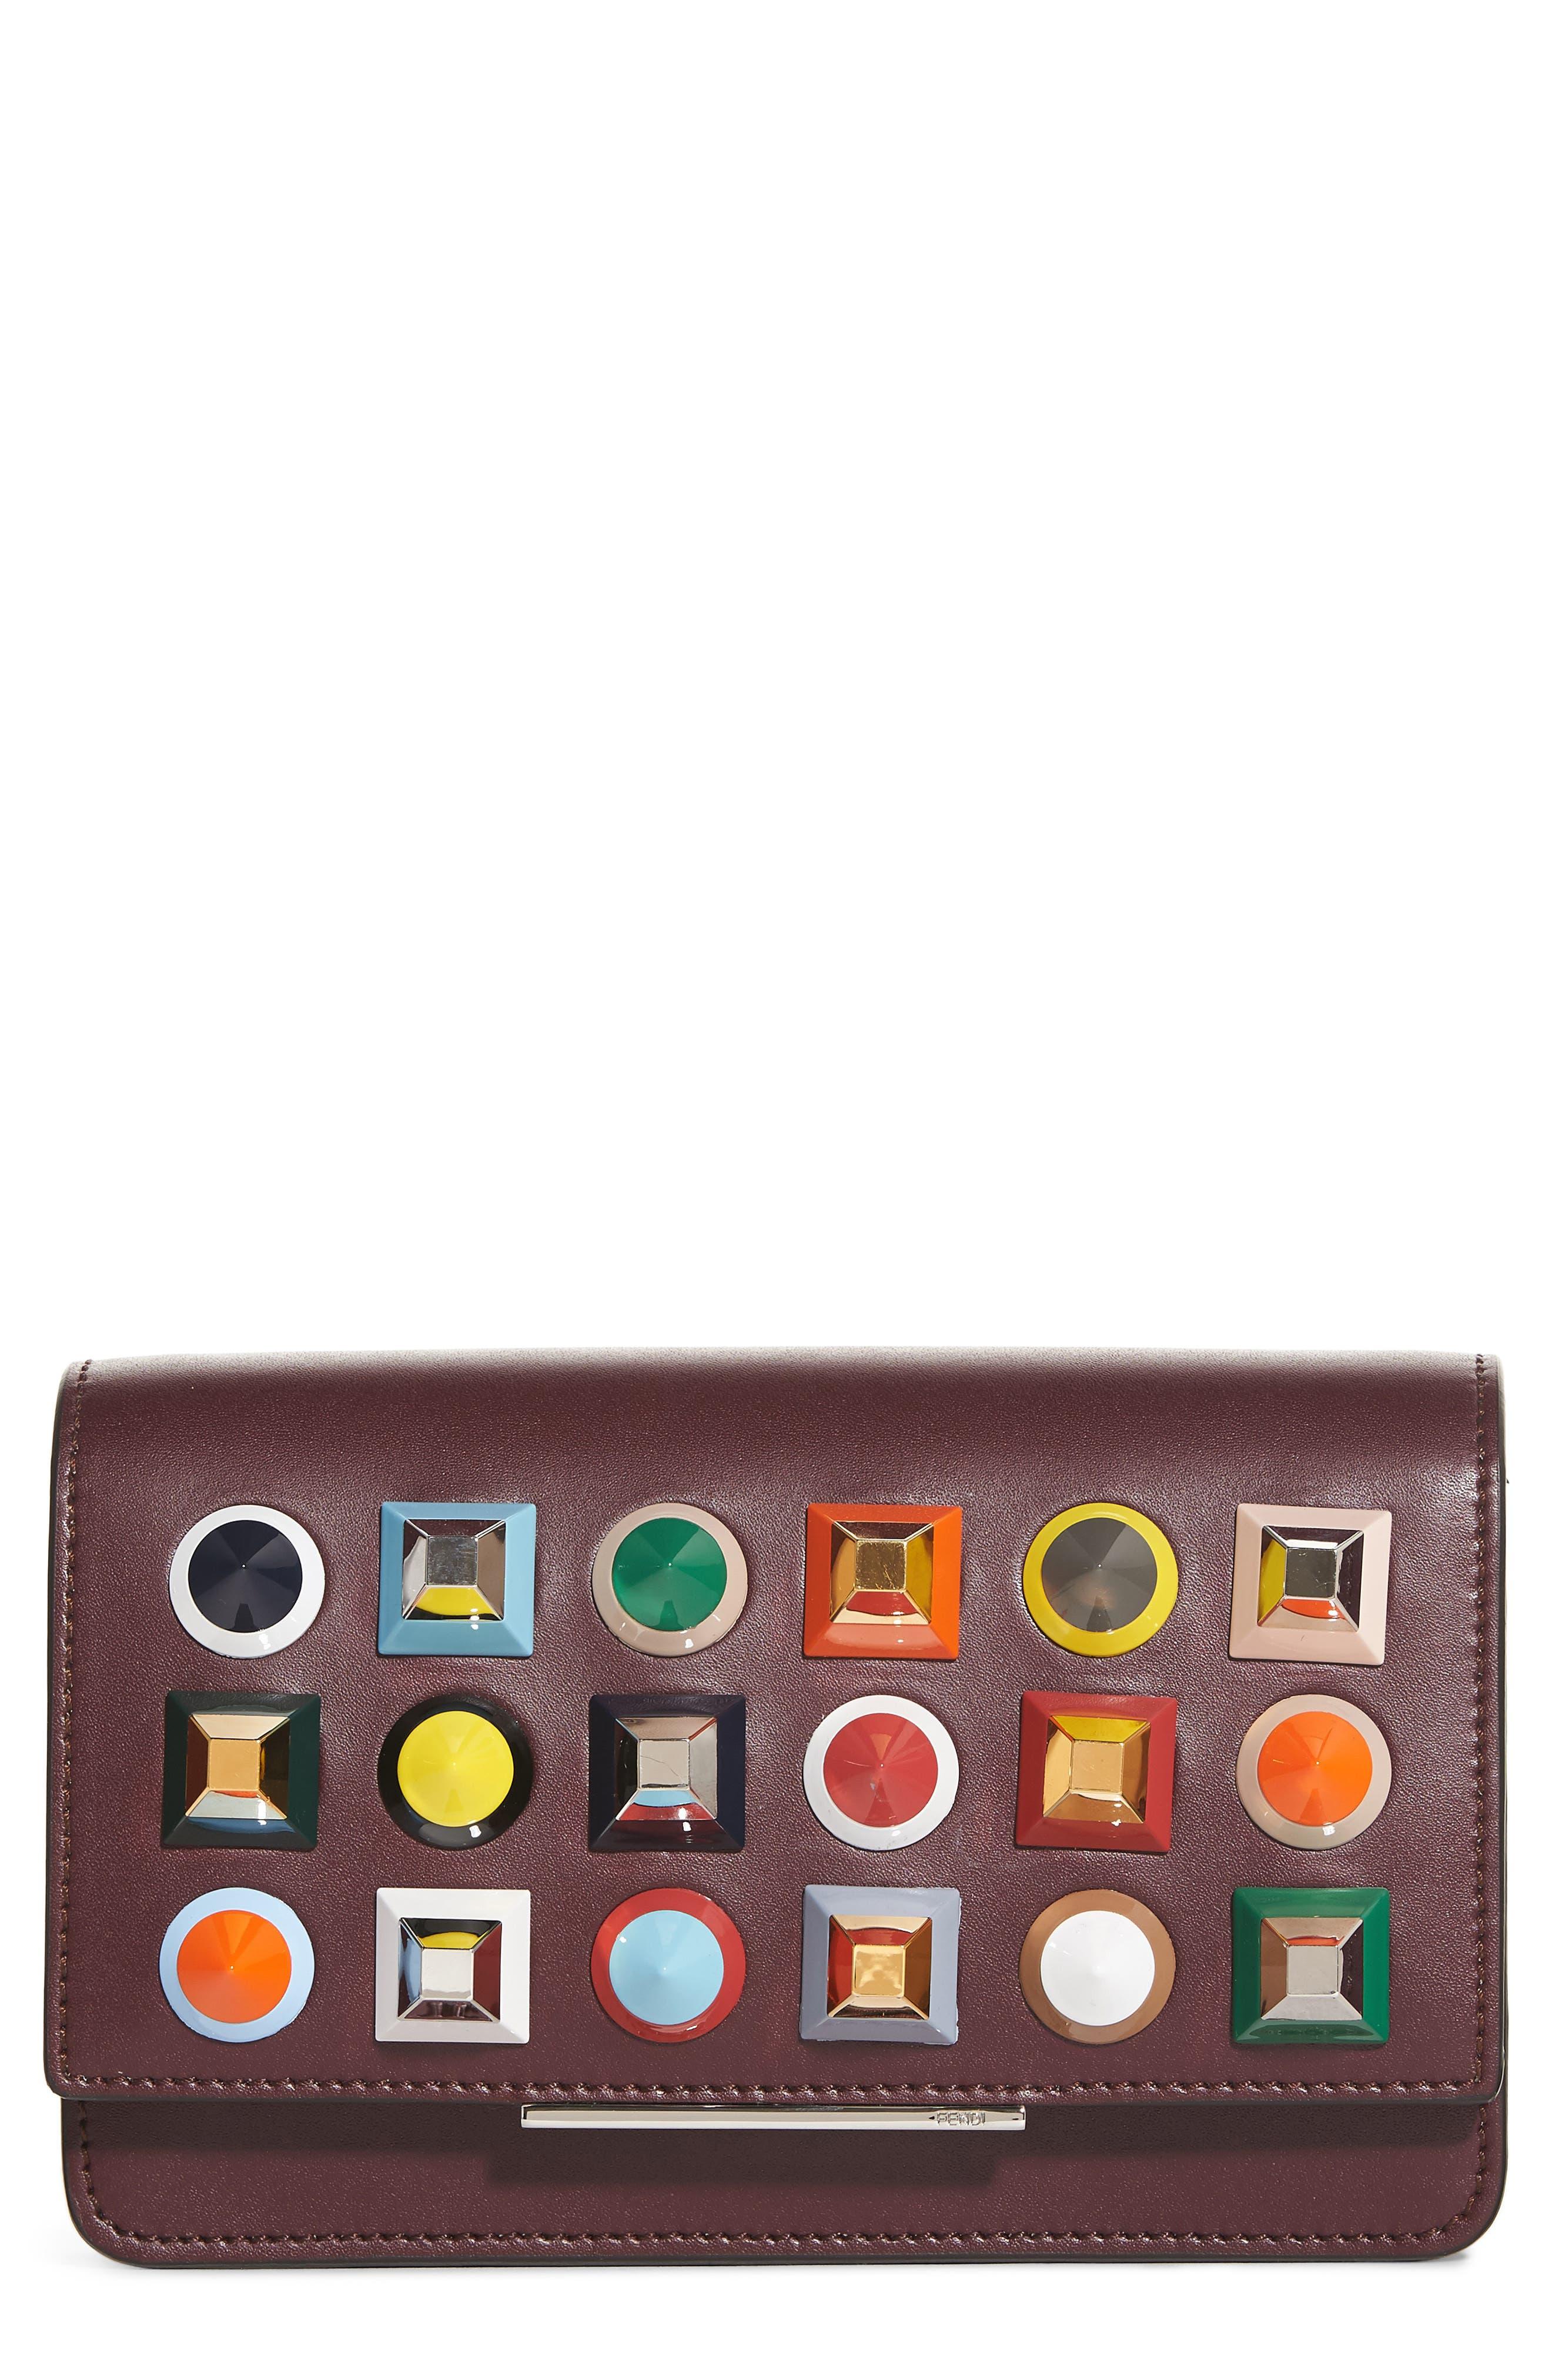 Fendi Rainbow Studded Leather Tube Wallet on a Chain